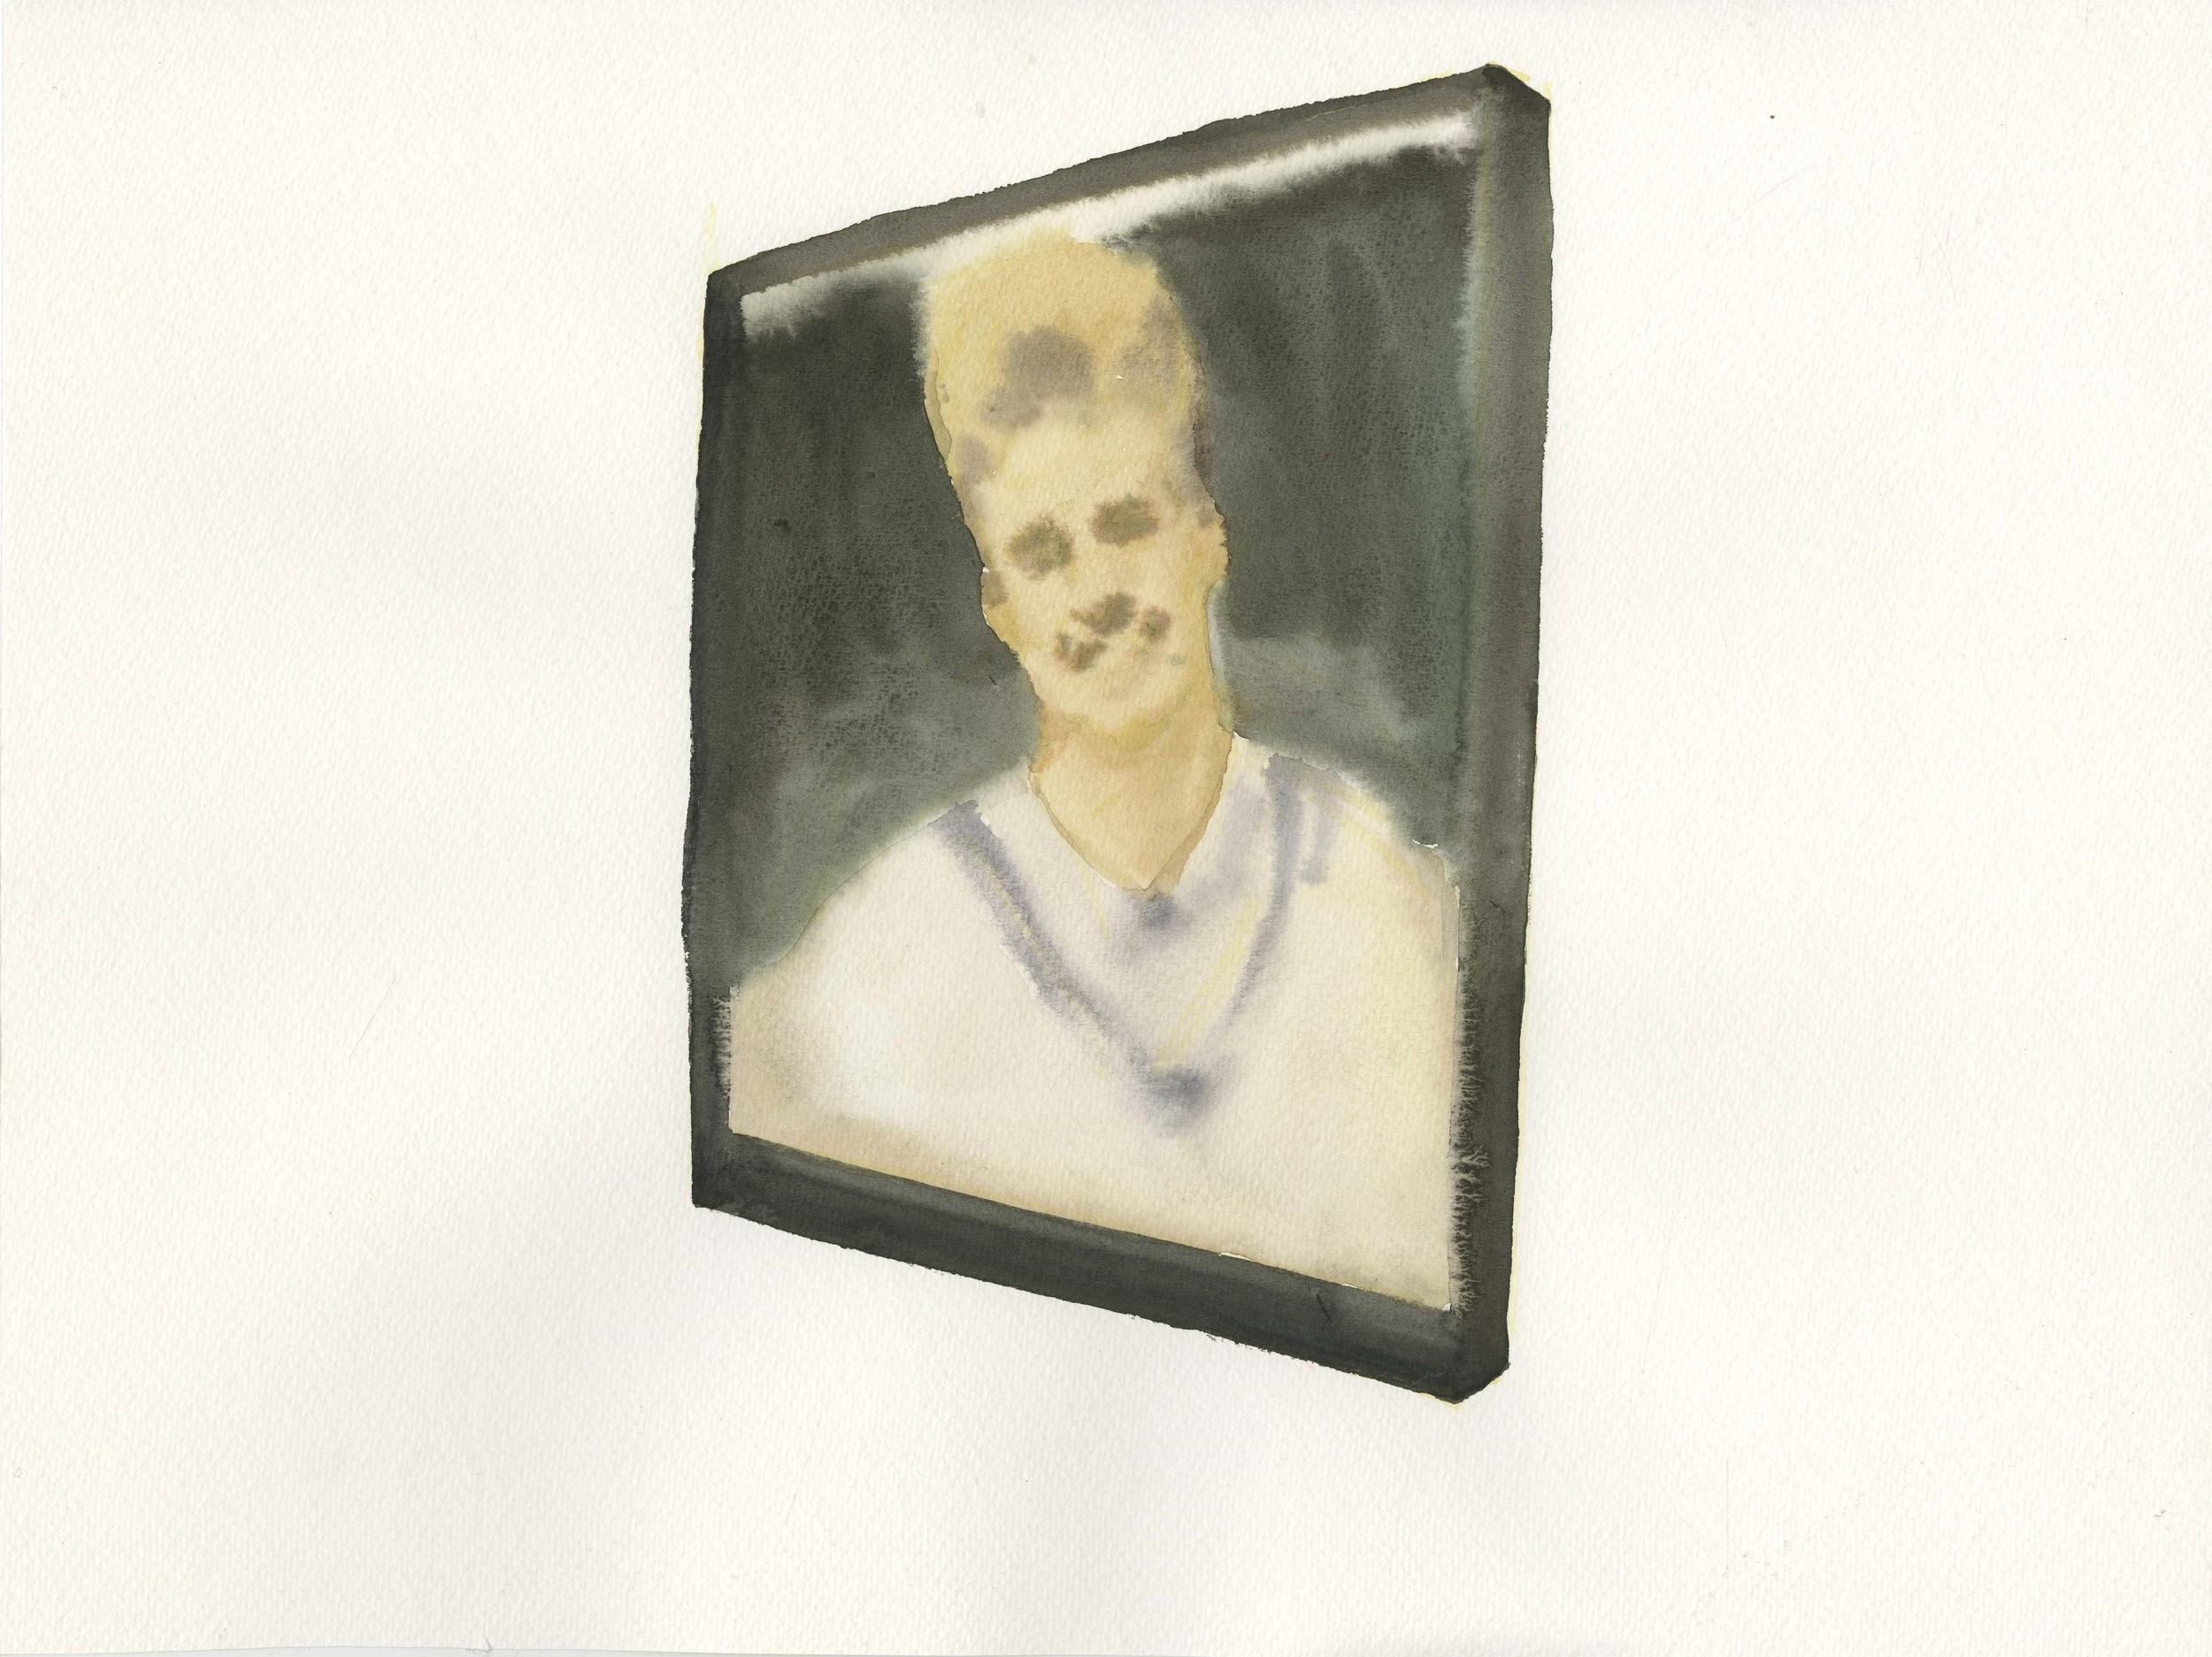 """Sigmar Lynch"", 2014, Watercolor on Paper 纸上水彩 12 x 16.1 in. (30.5 x 40.6 cm)"